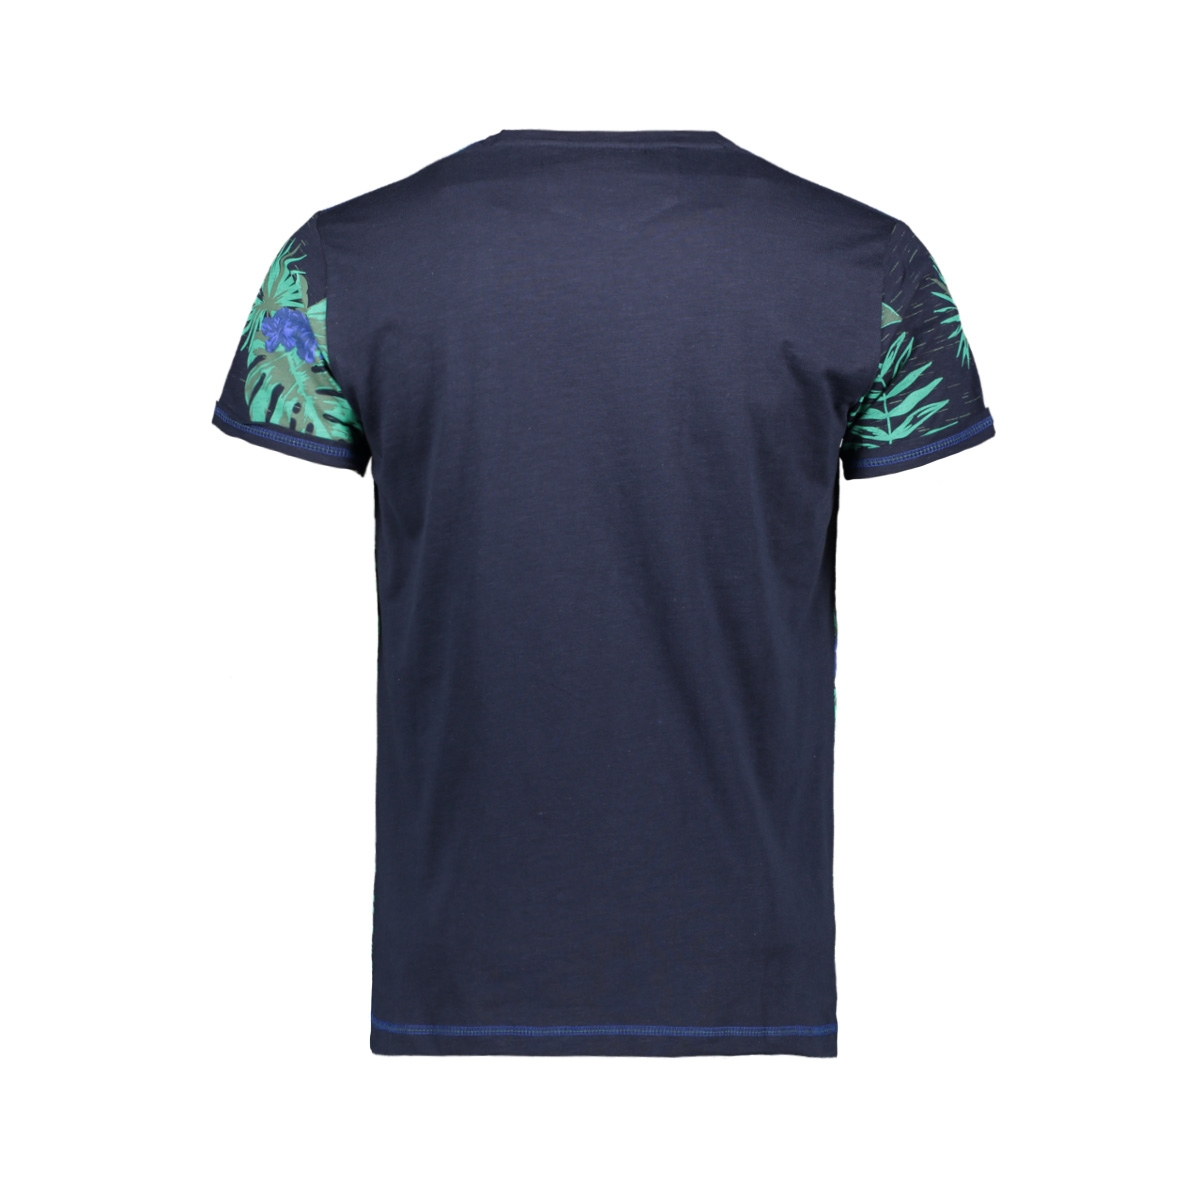 t shirt 15195 gabbiano t-shirt navy